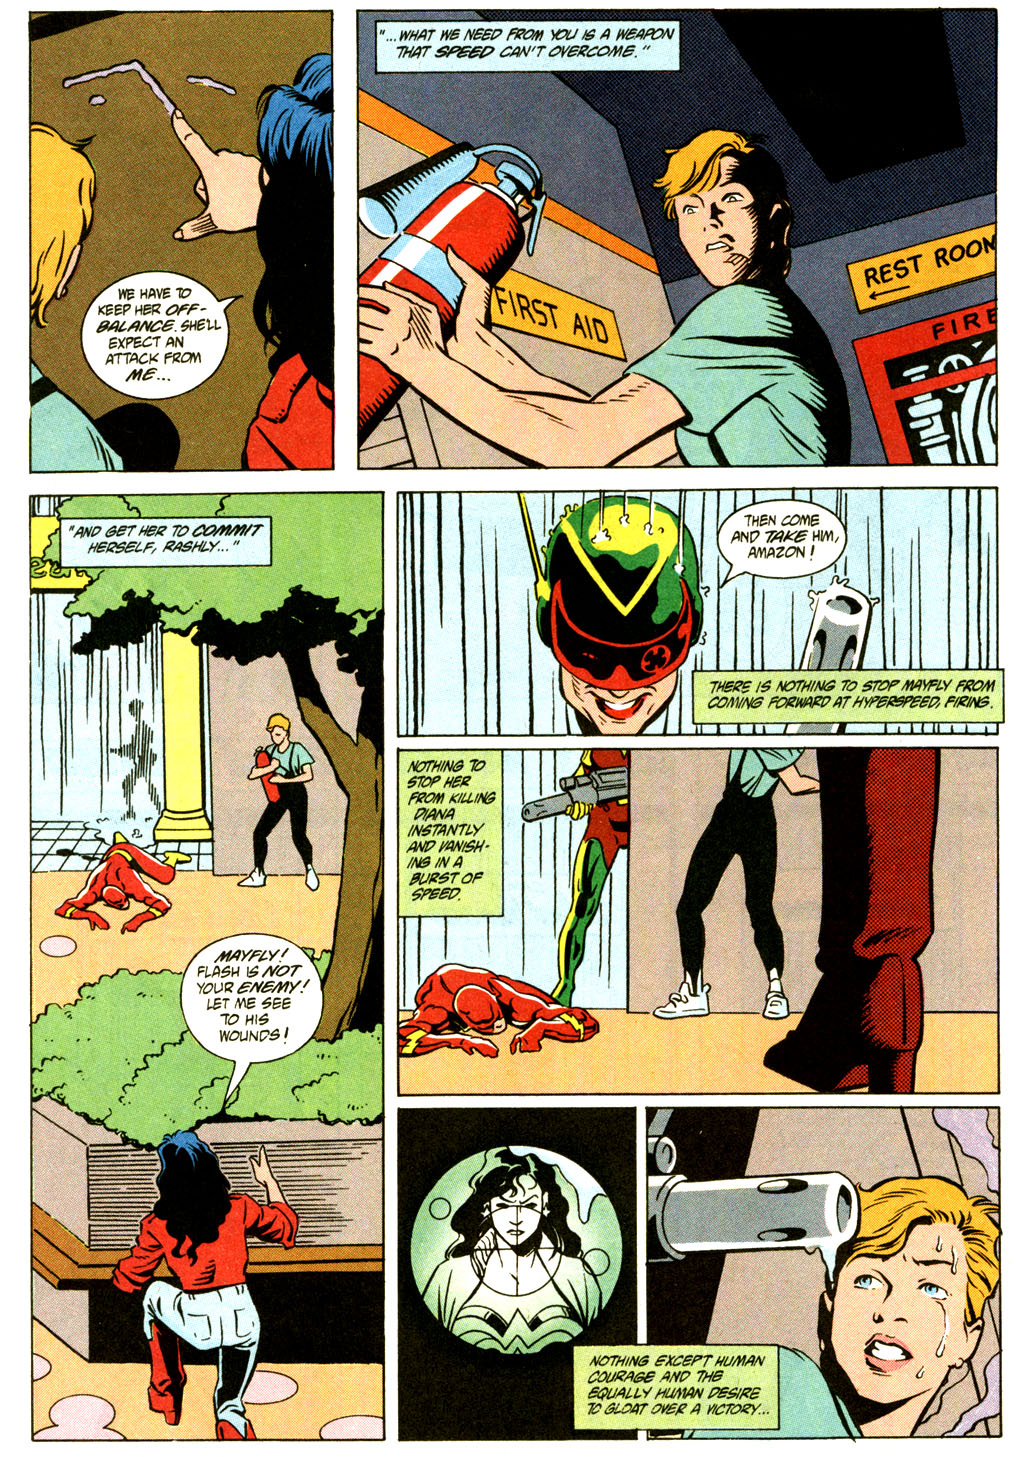 Read online Wonder Woman (1987) comic -  Issue #79 - 6